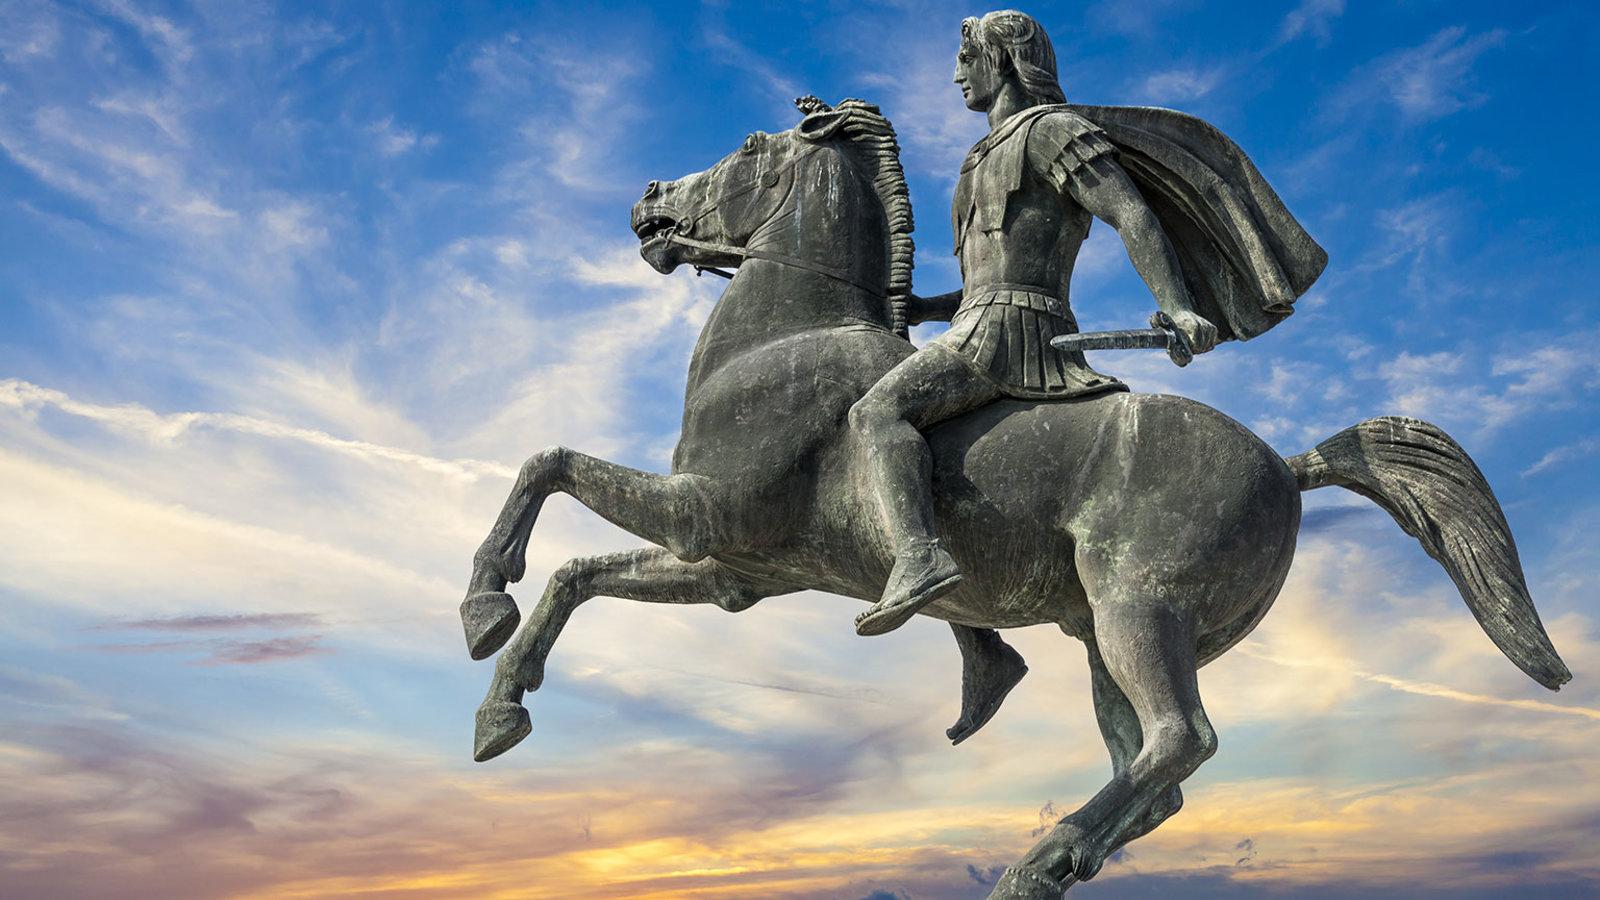 Alexander The Great Statue - HD Wallpaper